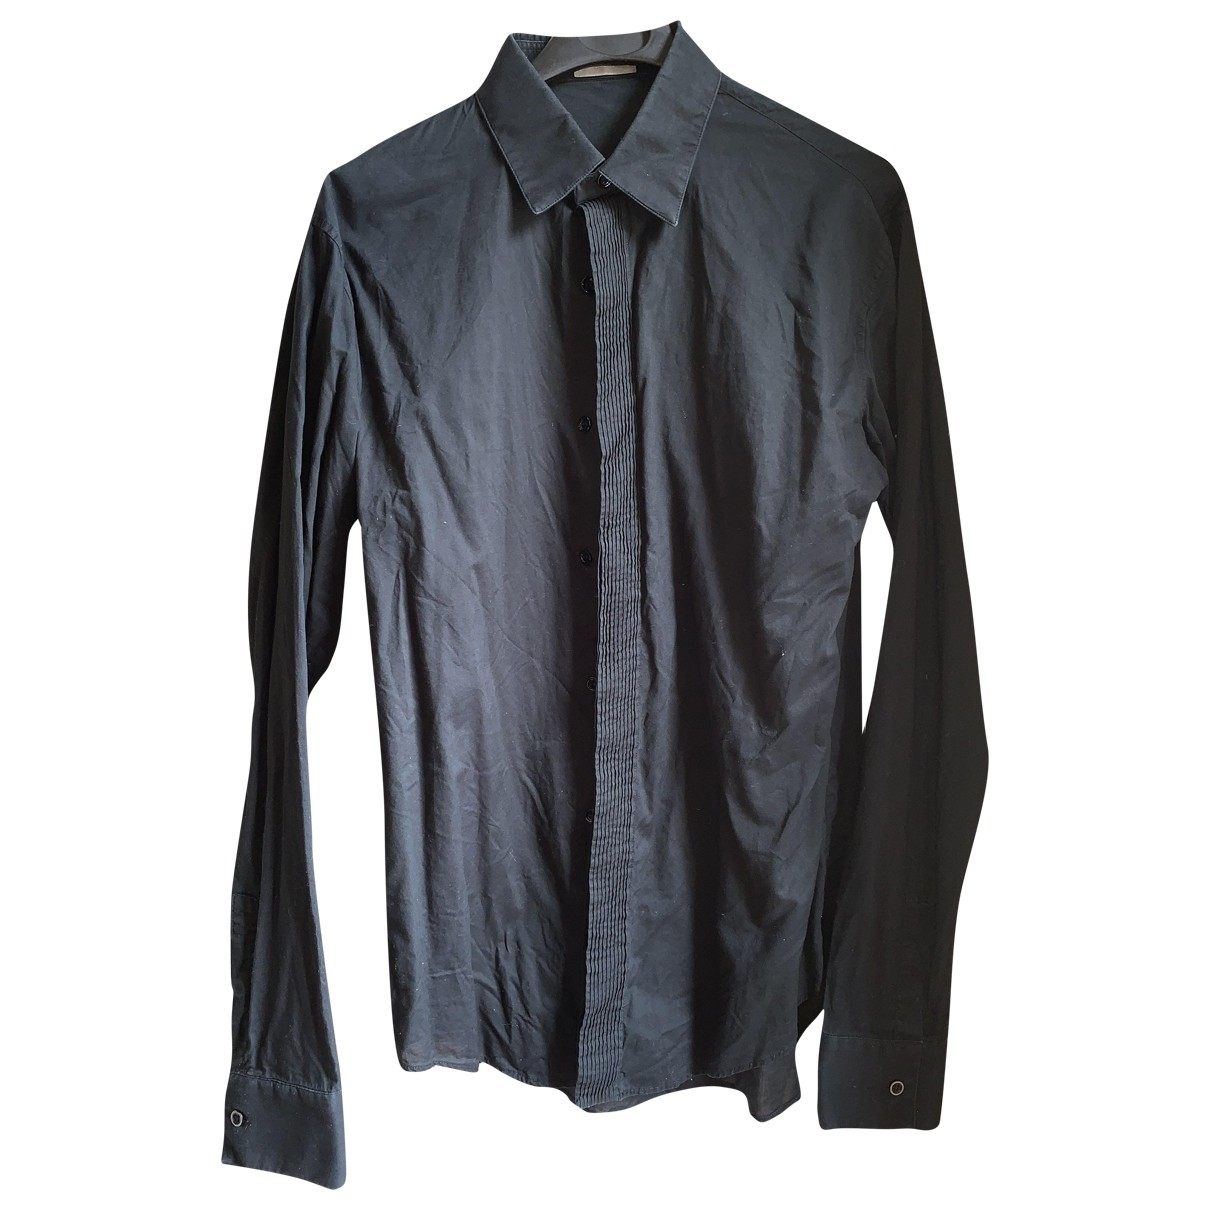 Dior Homme \N Black Cotton Shirts for Men 39 EU (tour de cou / collar)